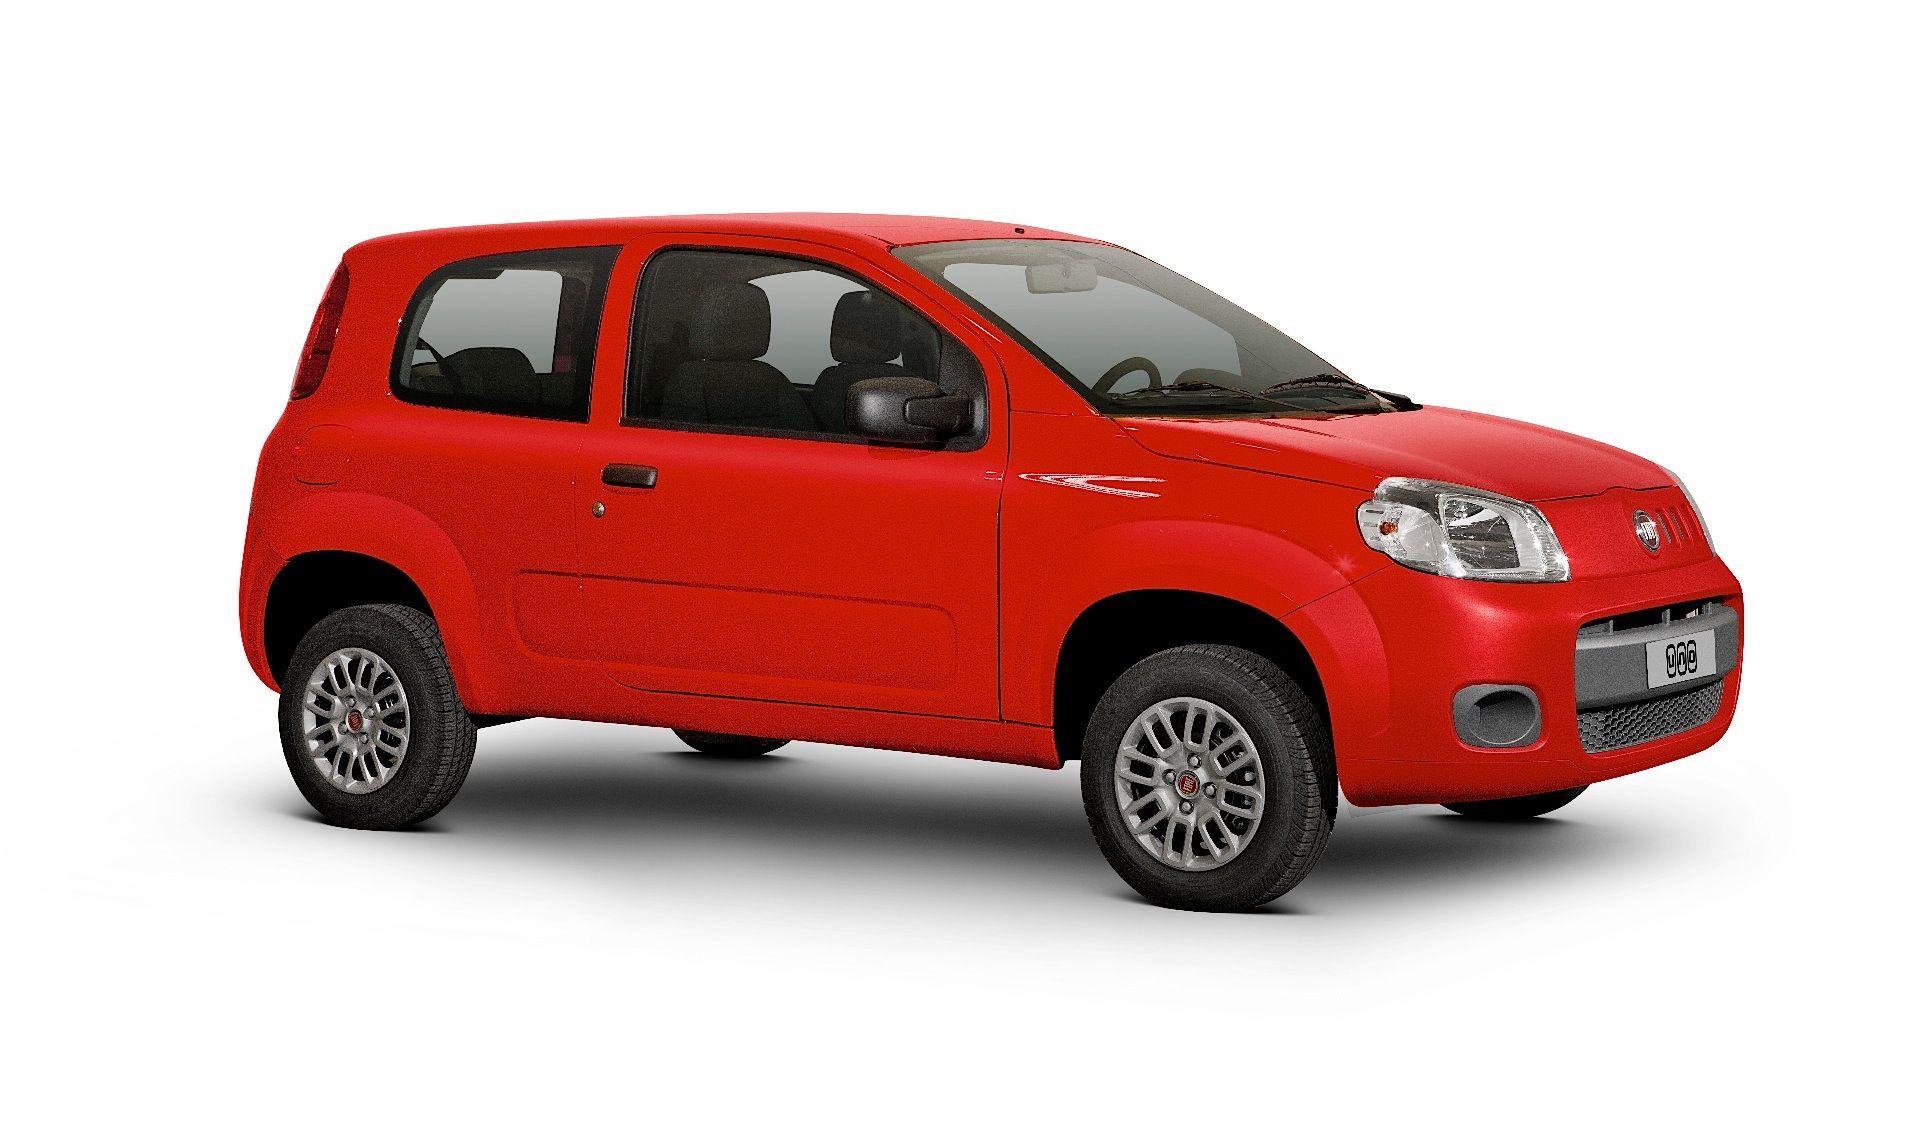 Fiat Uno Specs Photos 2010 2011 2012 2013 2014 2015 2016